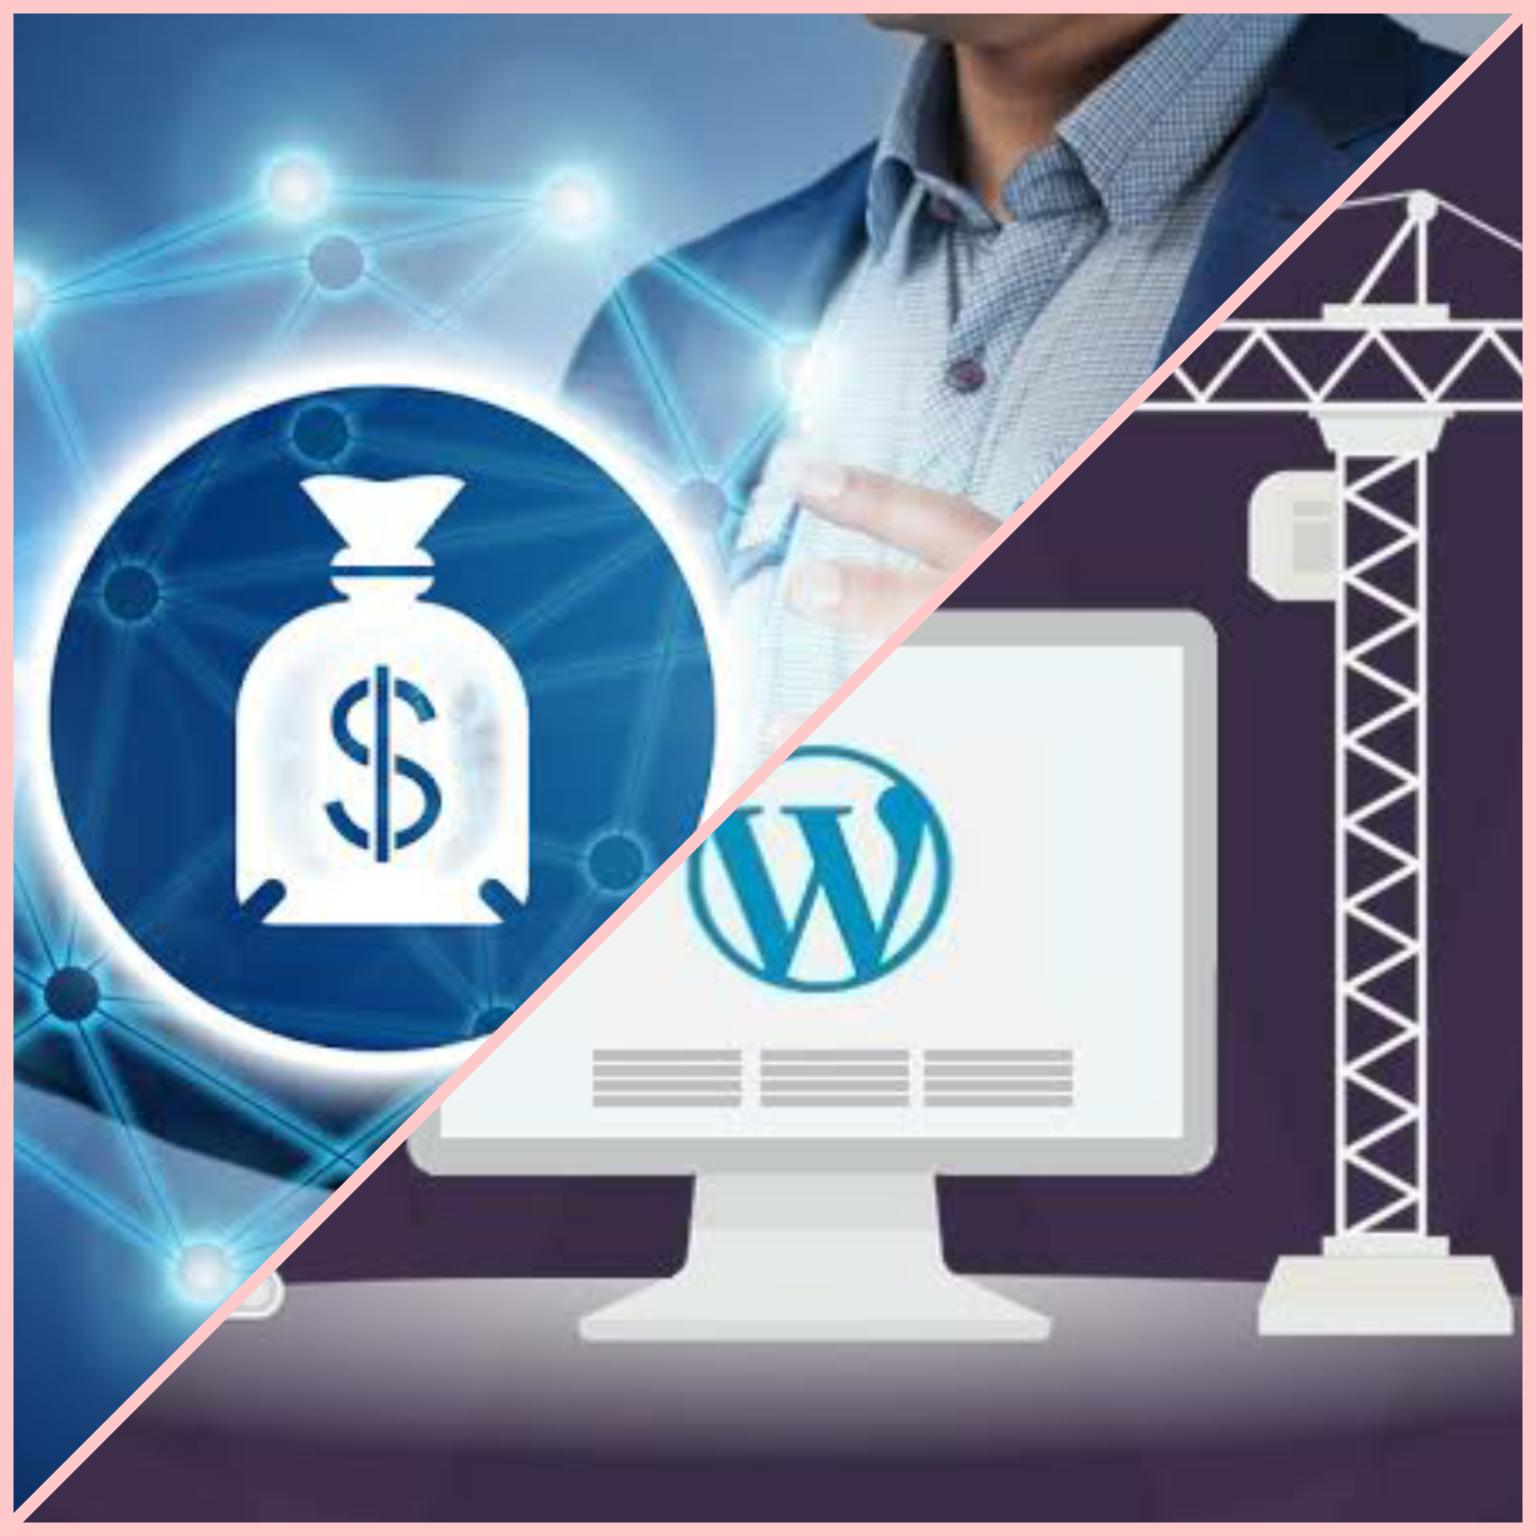 [Part-1]২মিনিটে একটি WordPress Website খুলে Auto Blogging করে টাকা আয় করুন